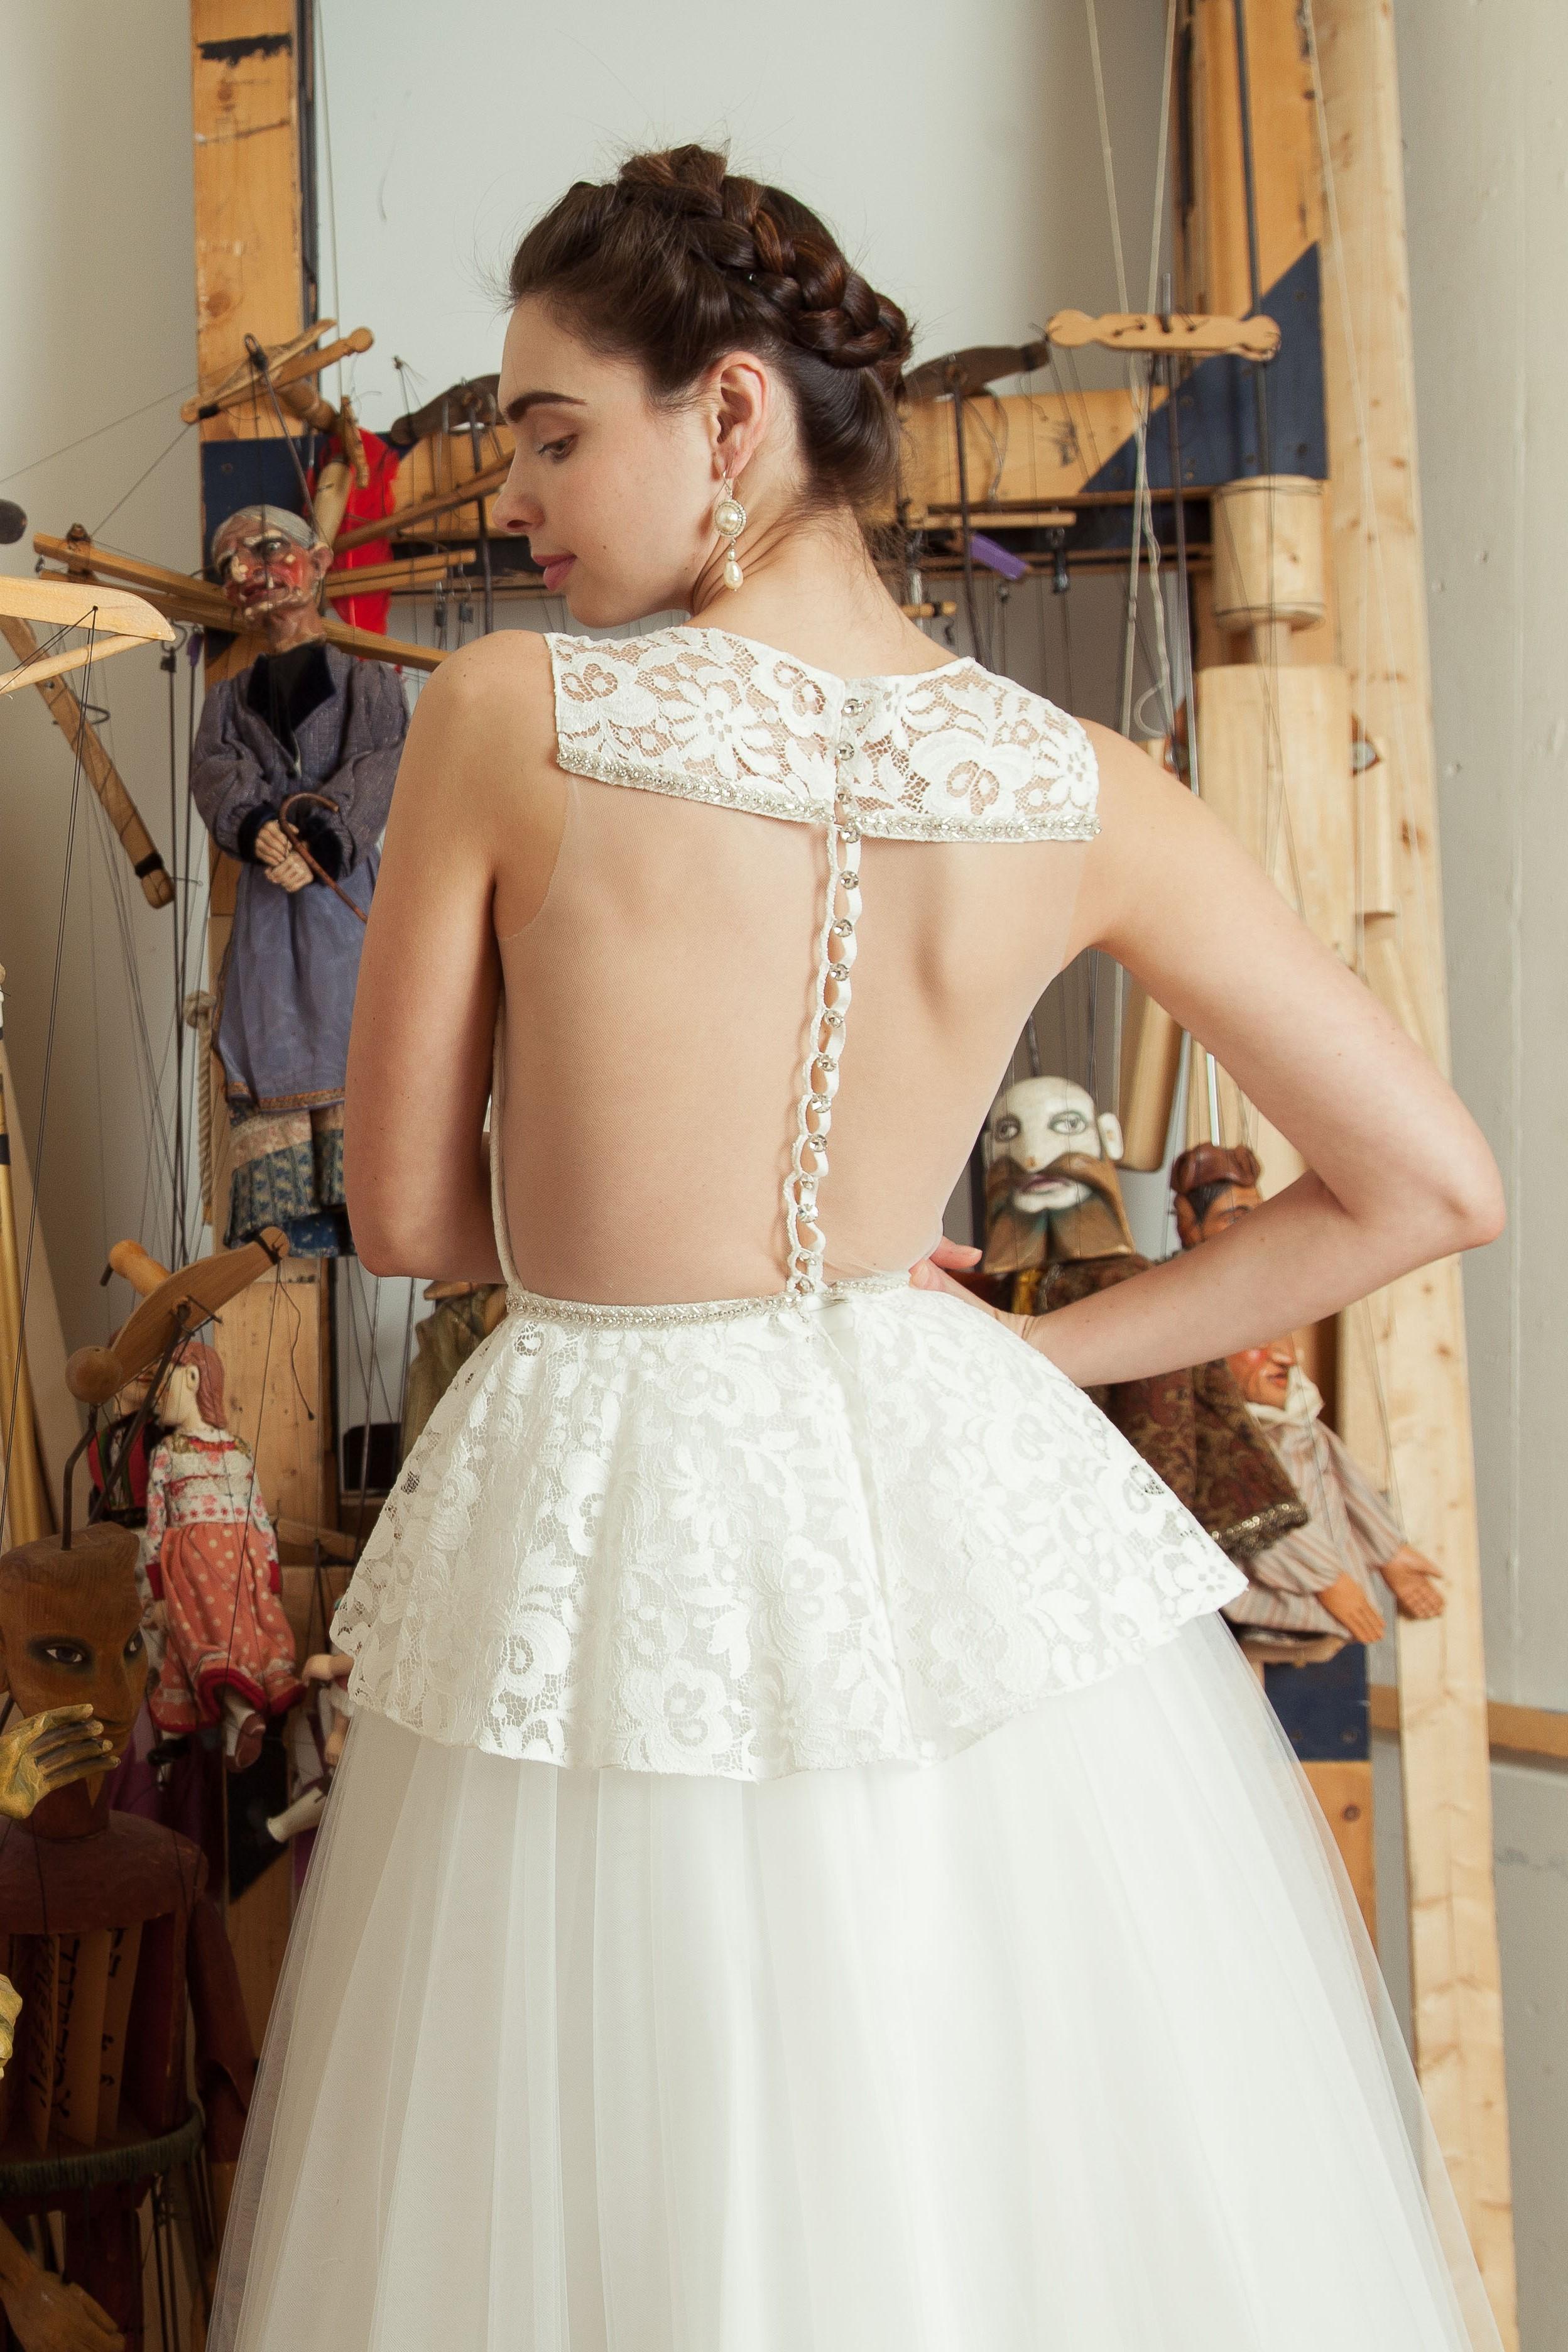 Lustige top with Brygida skirt